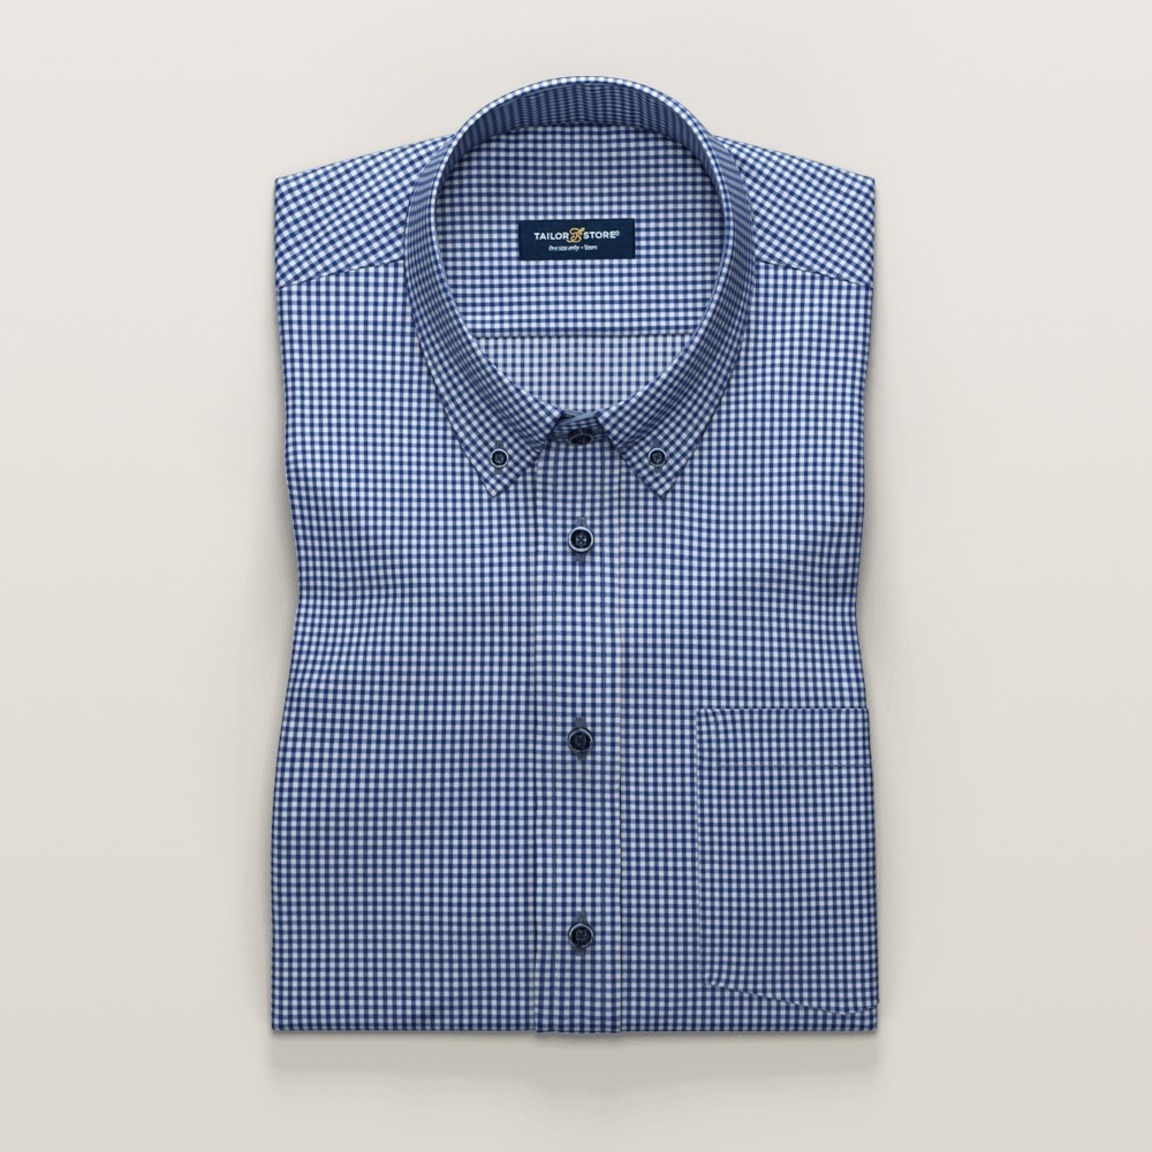 Short sleeved checked dark blue business shirt